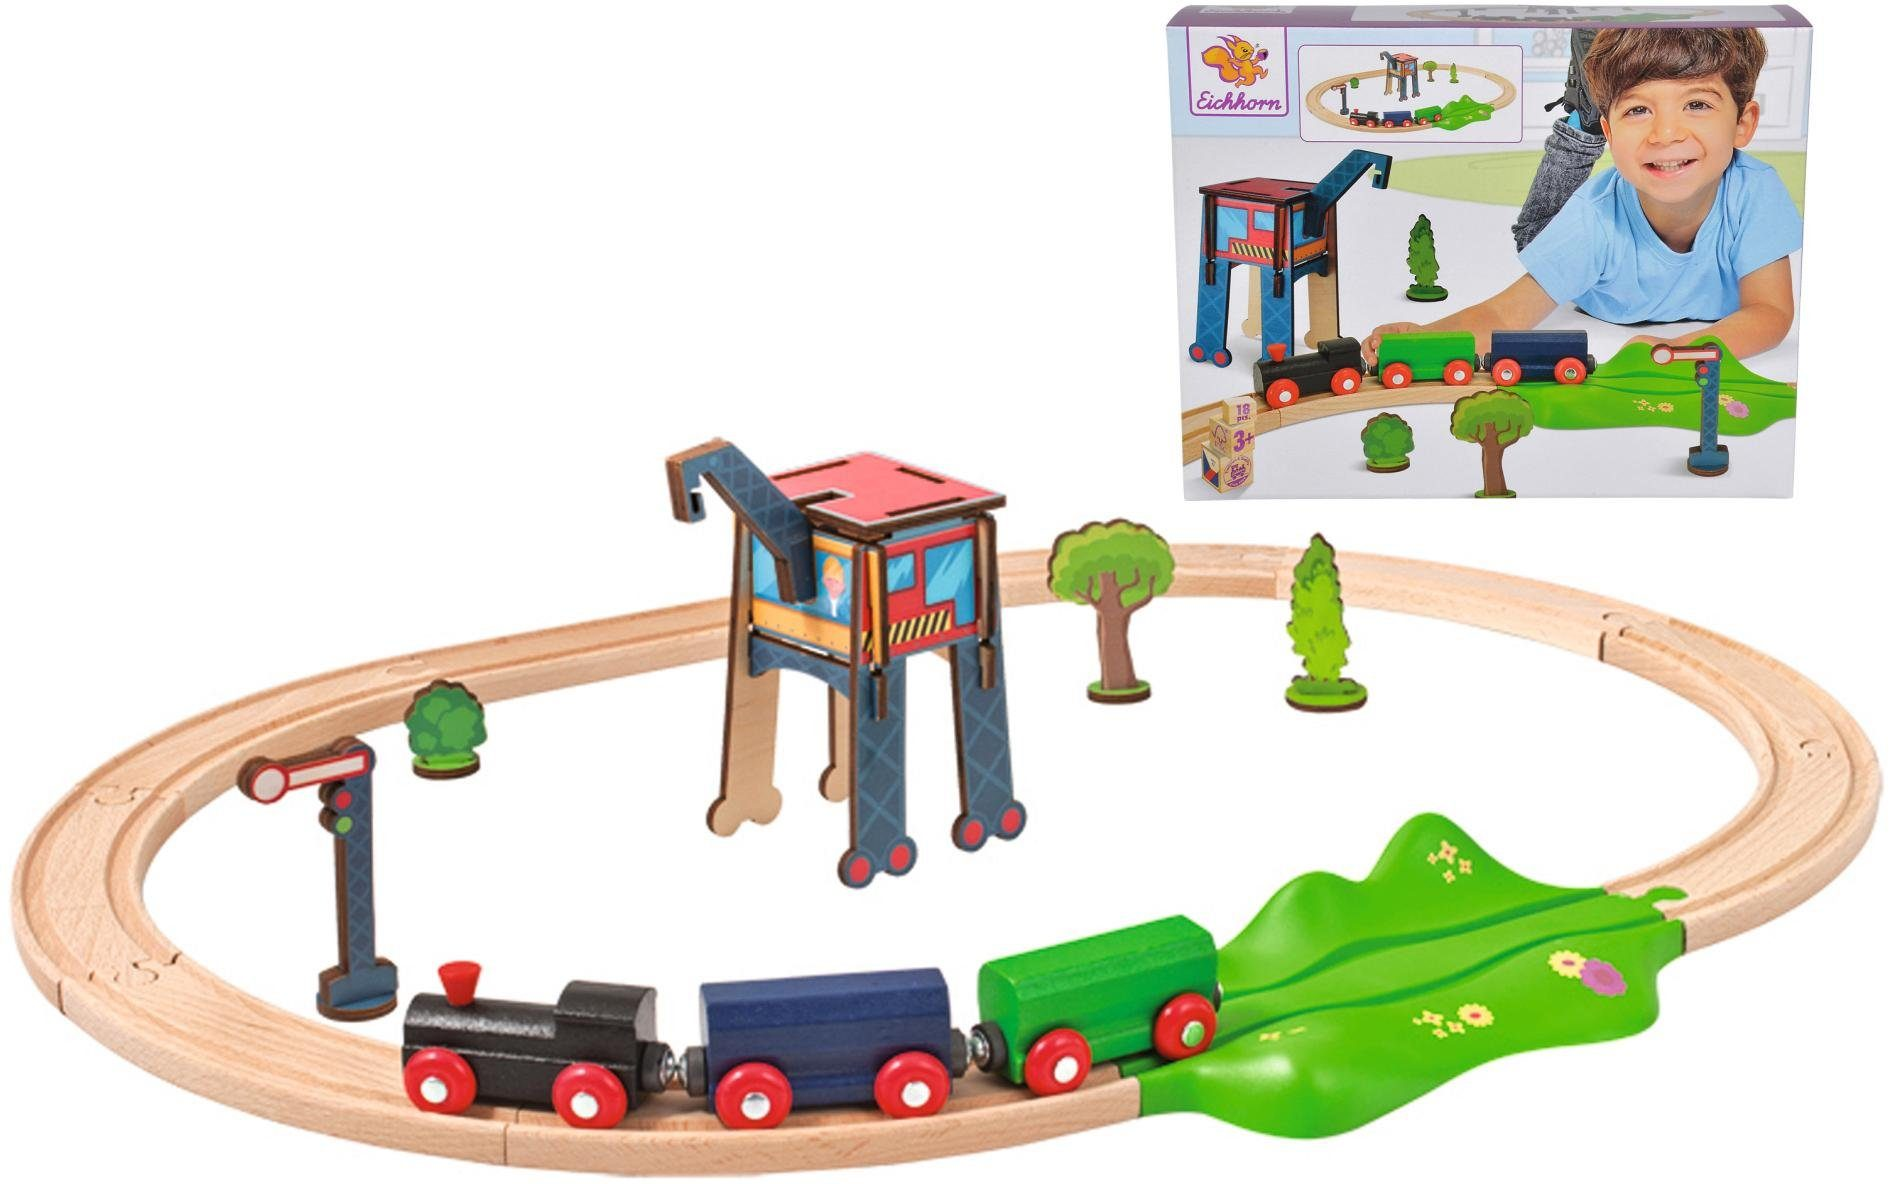 Eichhorn Schienenbahnset aus Holz, »Bahnset oval, 18-tlg.«